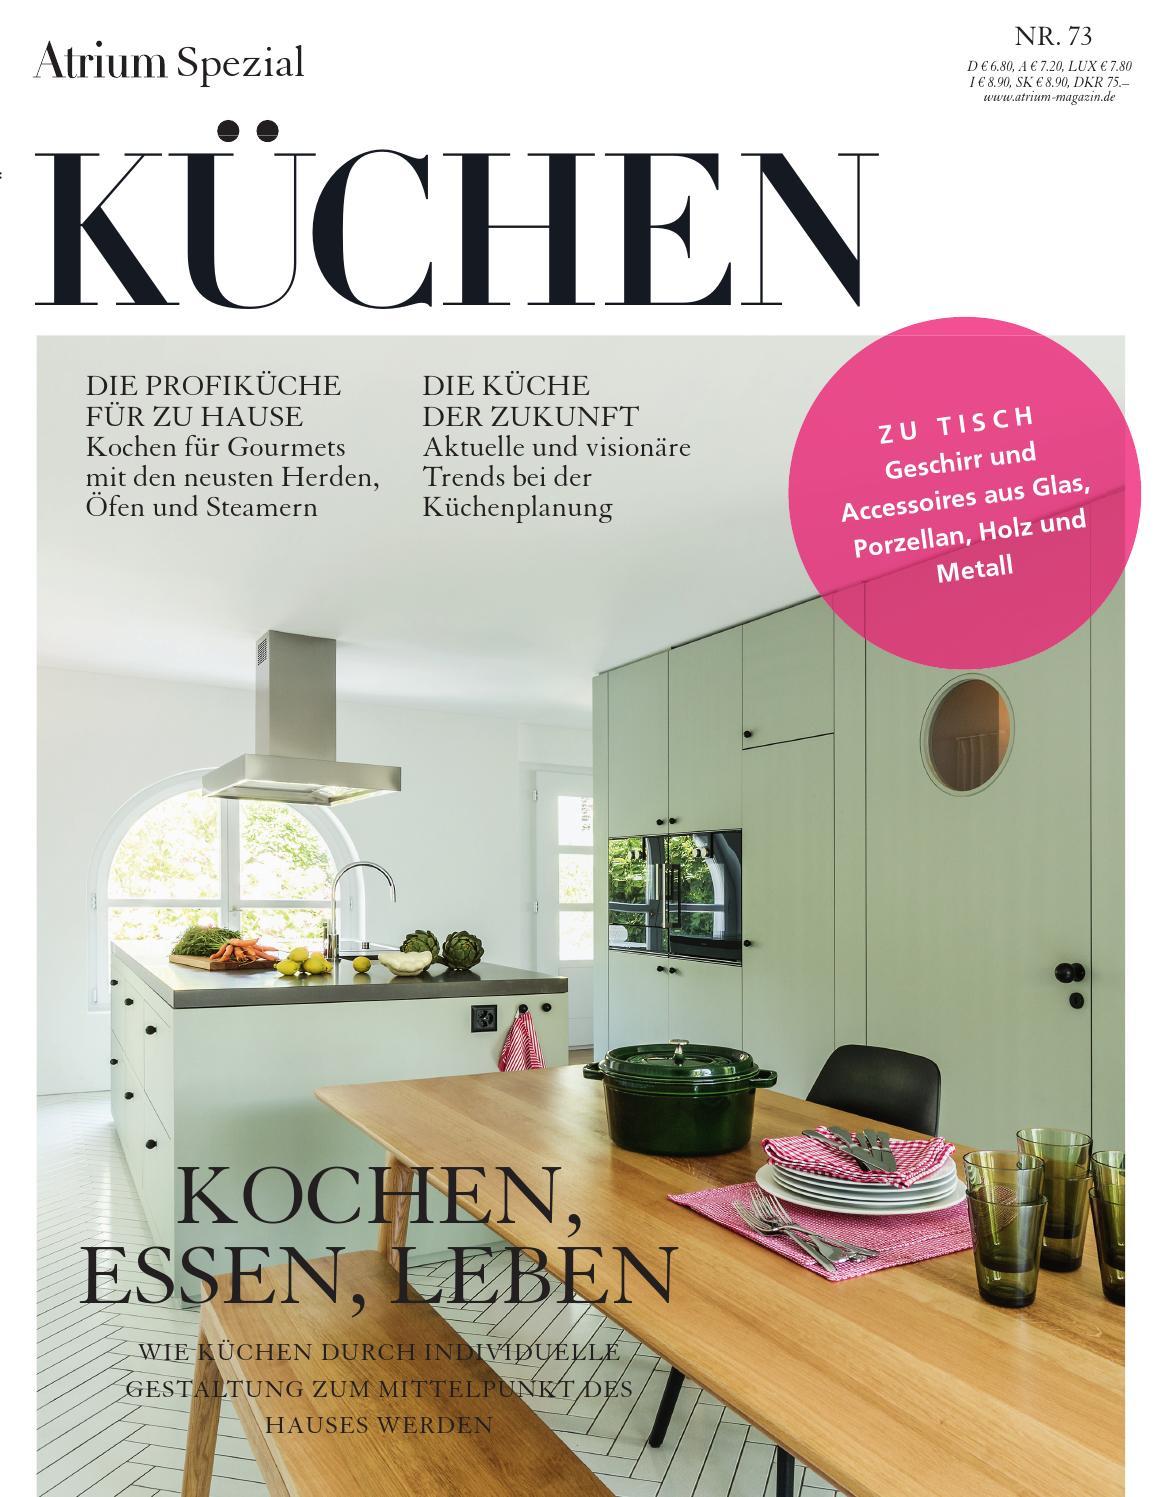 atrium spezial k chen 2015 by archithema verlag issuu. Black Bedroom Furniture Sets. Home Design Ideas